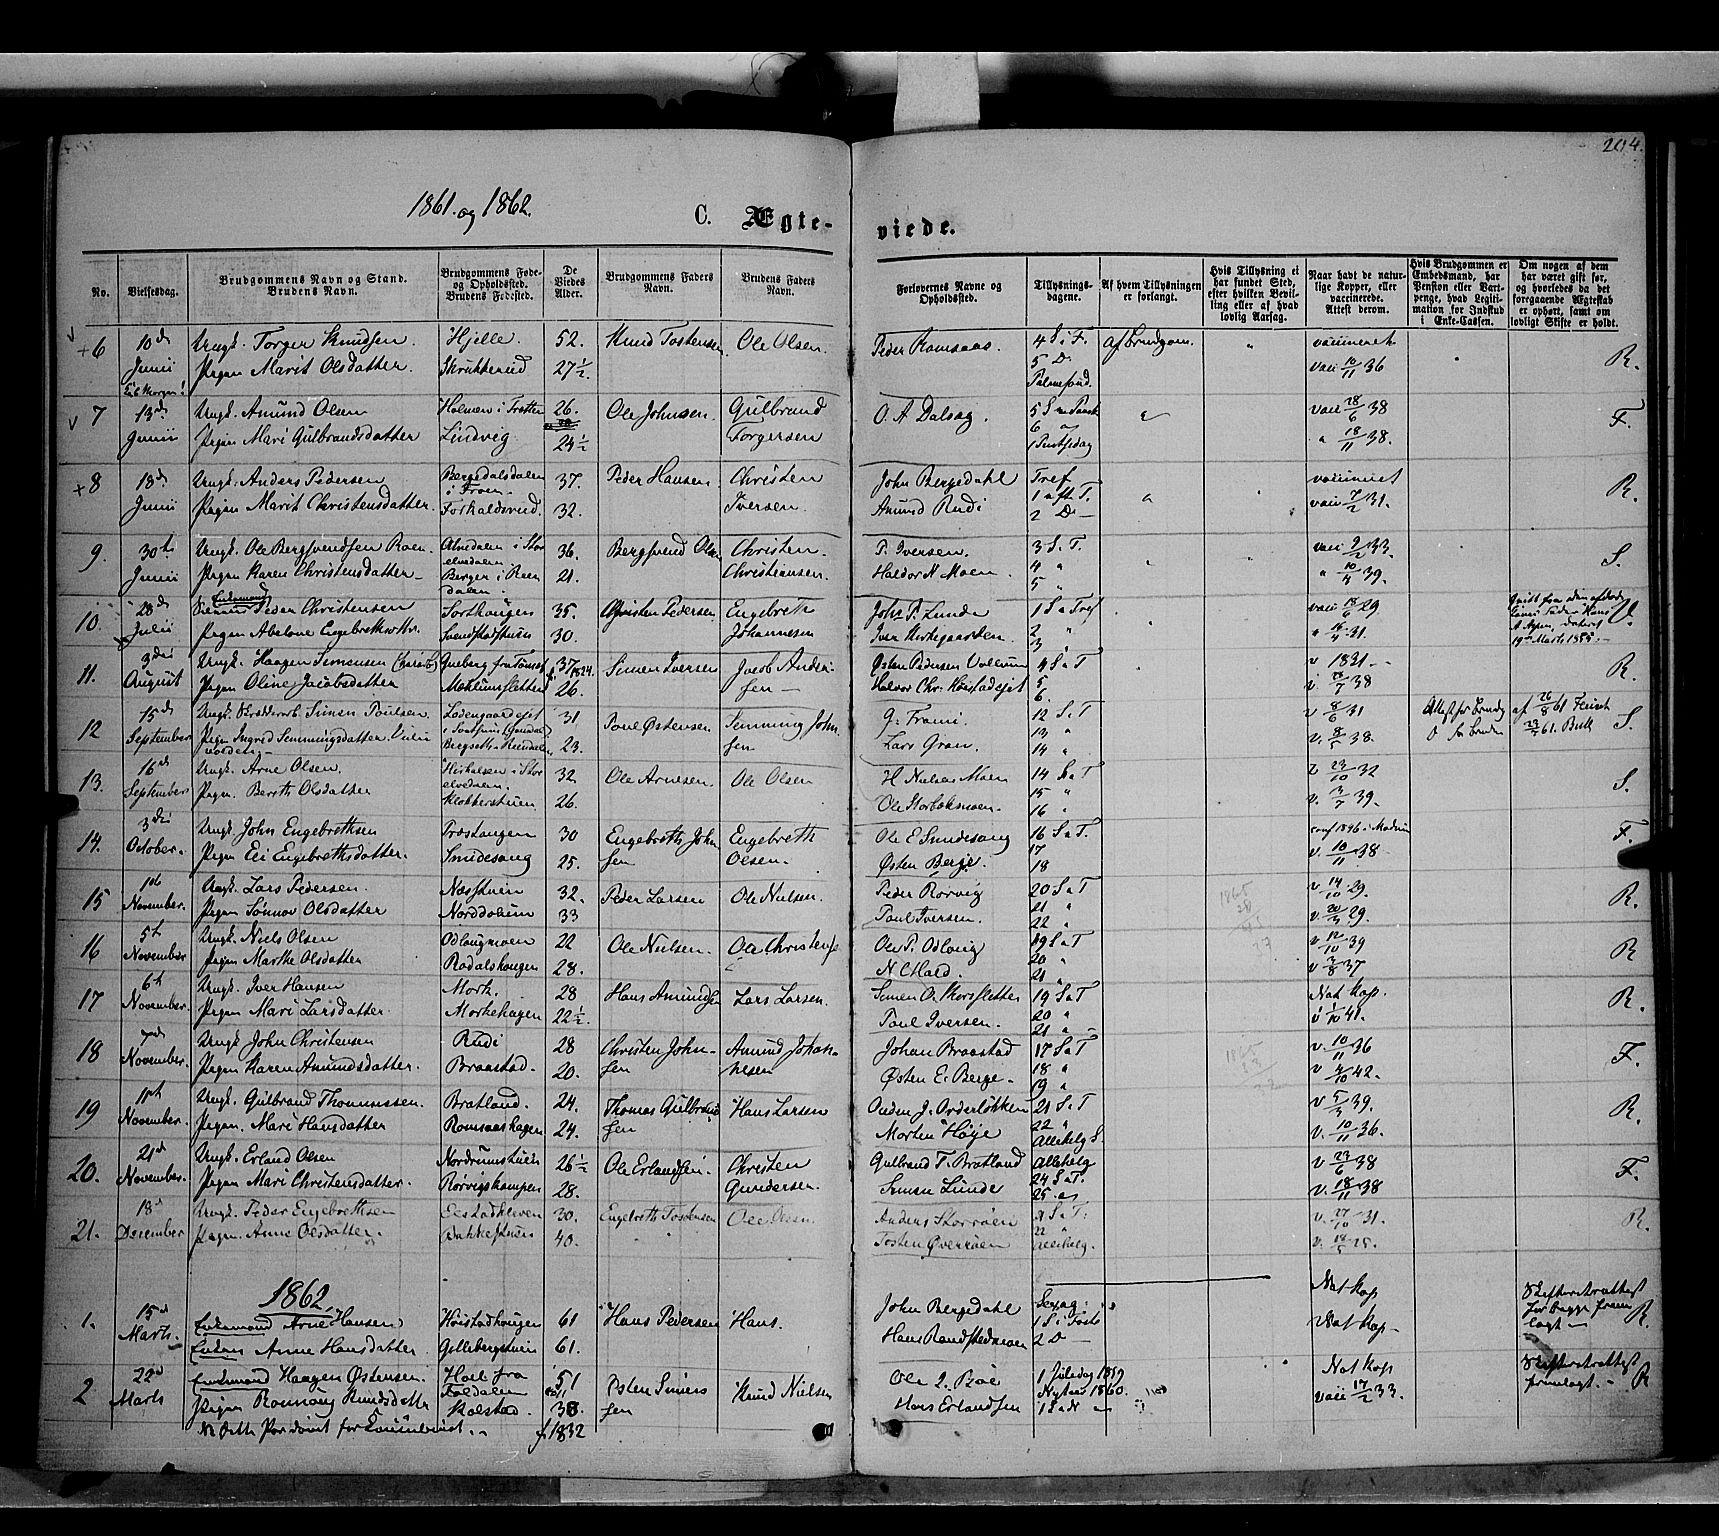 SAH, Ringebu prestekontor, Ministerialbok nr. 7, 1860-1877, s. 204